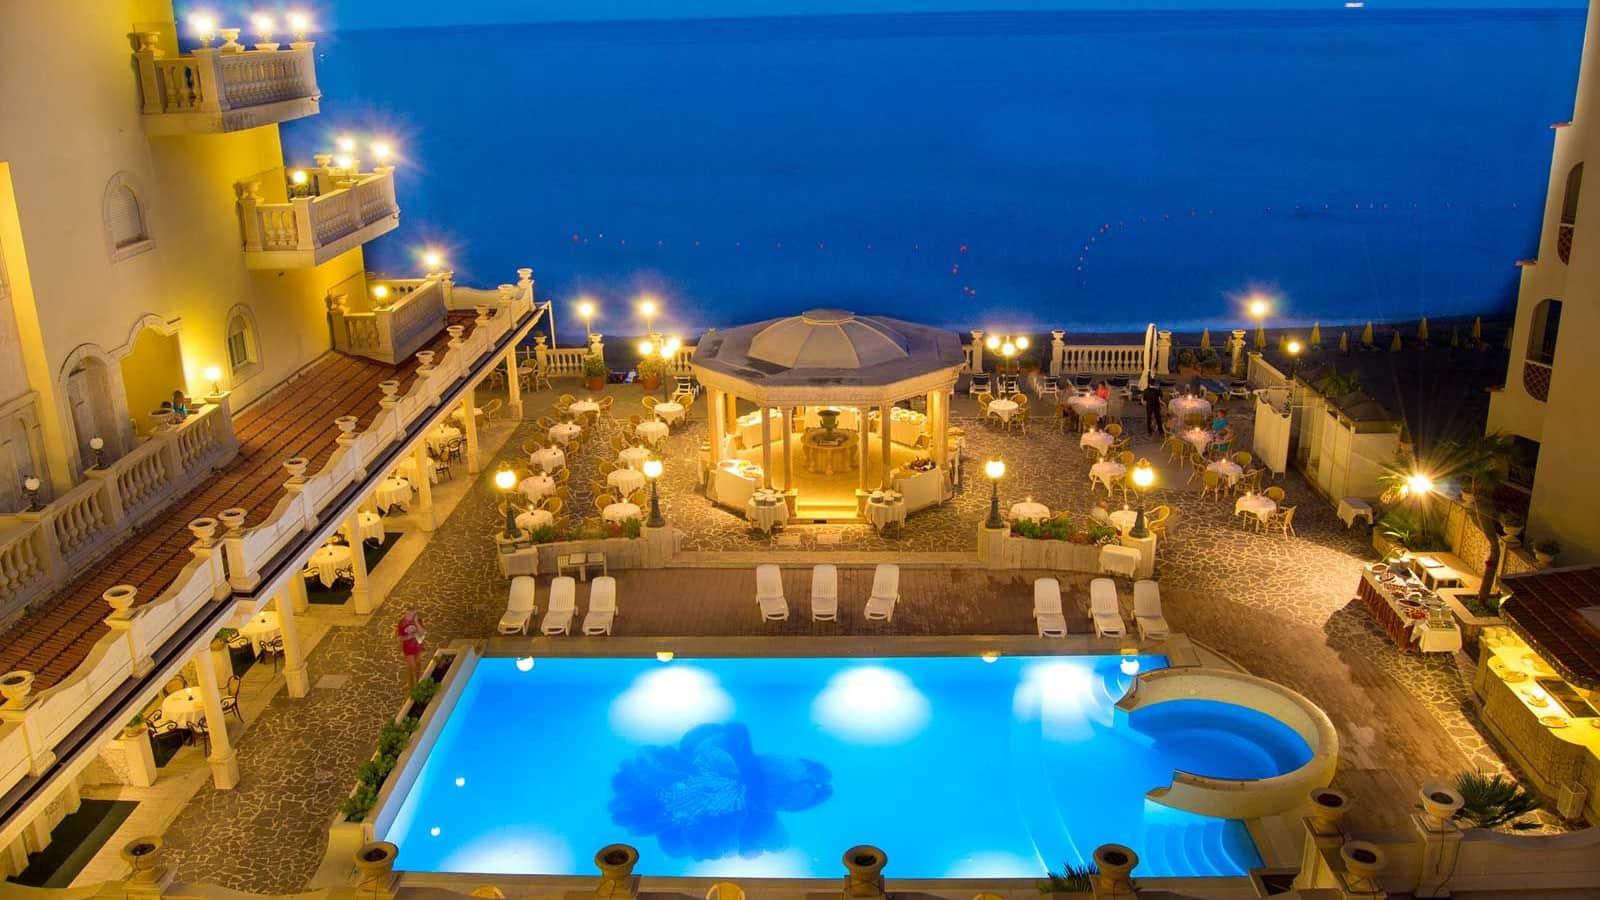 Hotel hellenia yachting giardini naxos sicily topflight